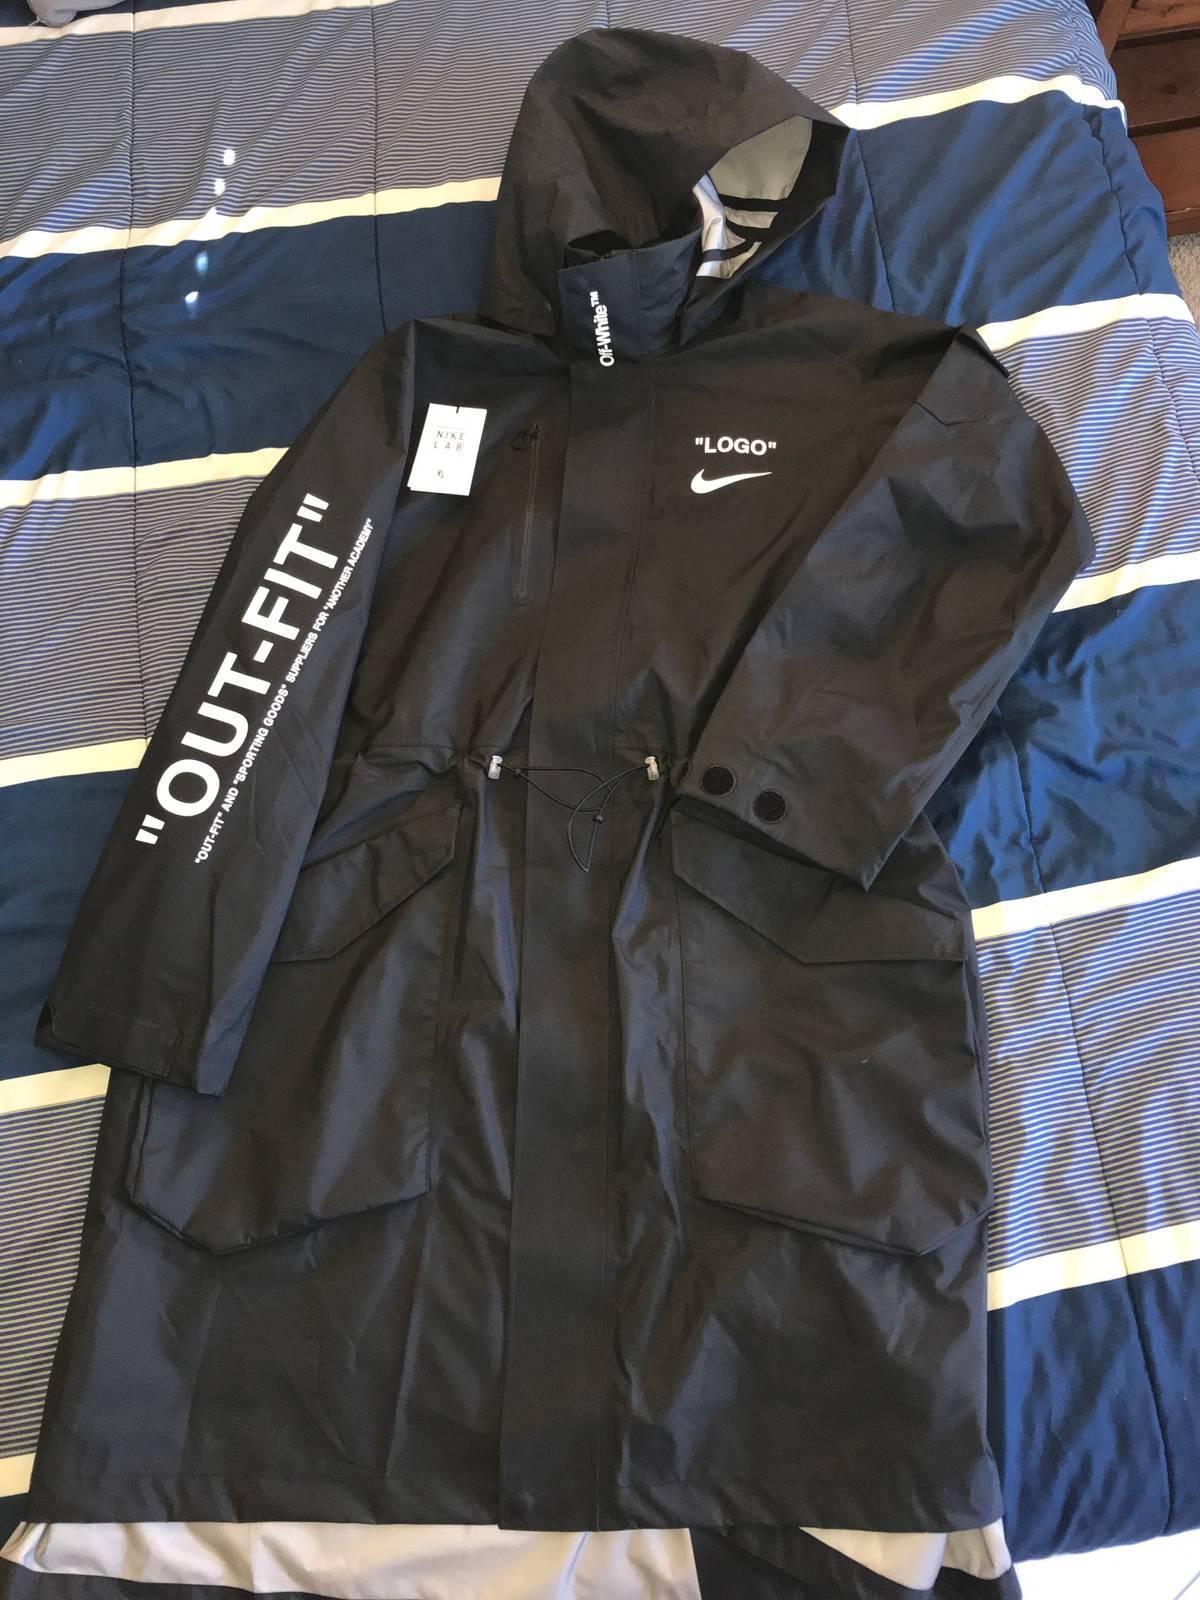 e044242001f93 Nike × Off-White × Nike ACG ×. Nikelab x OFF-WHITE Mercurial NRG X Jacket  Black